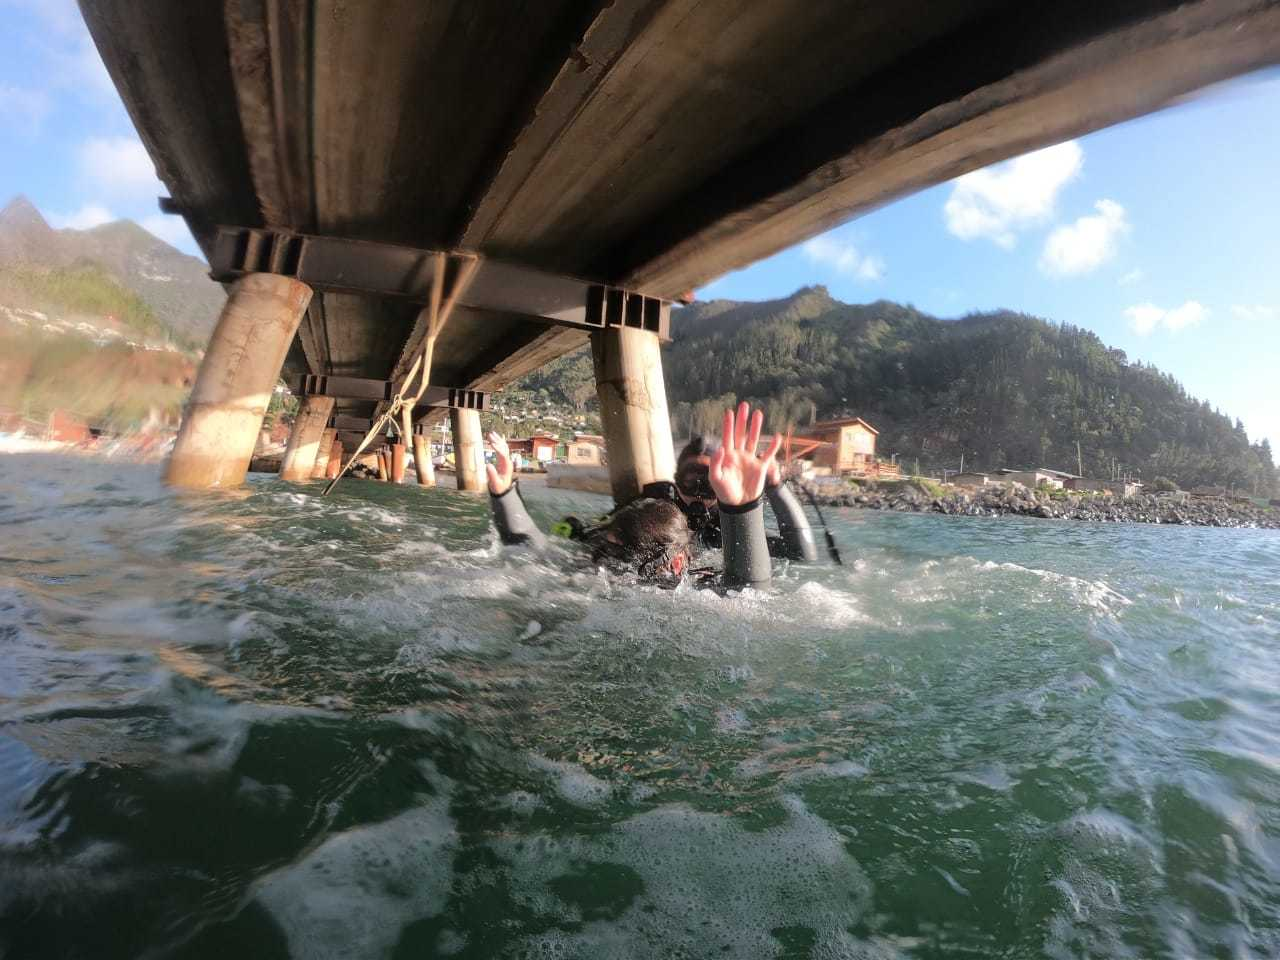 Curso PADI Rescue Diver en el Archipiélago Juan Fernández